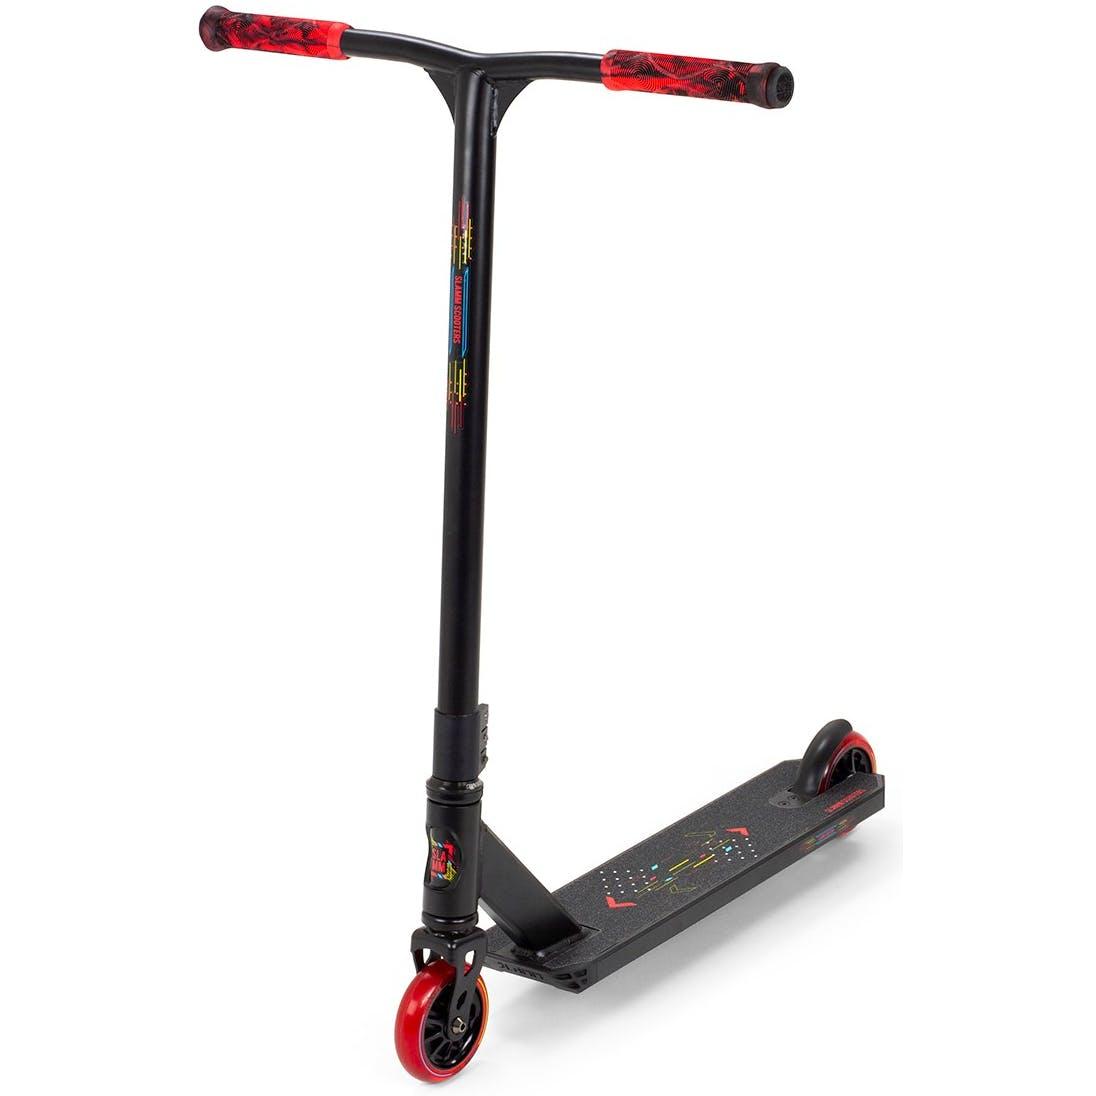 Slamm Classic V9 Stunt Scooter Red